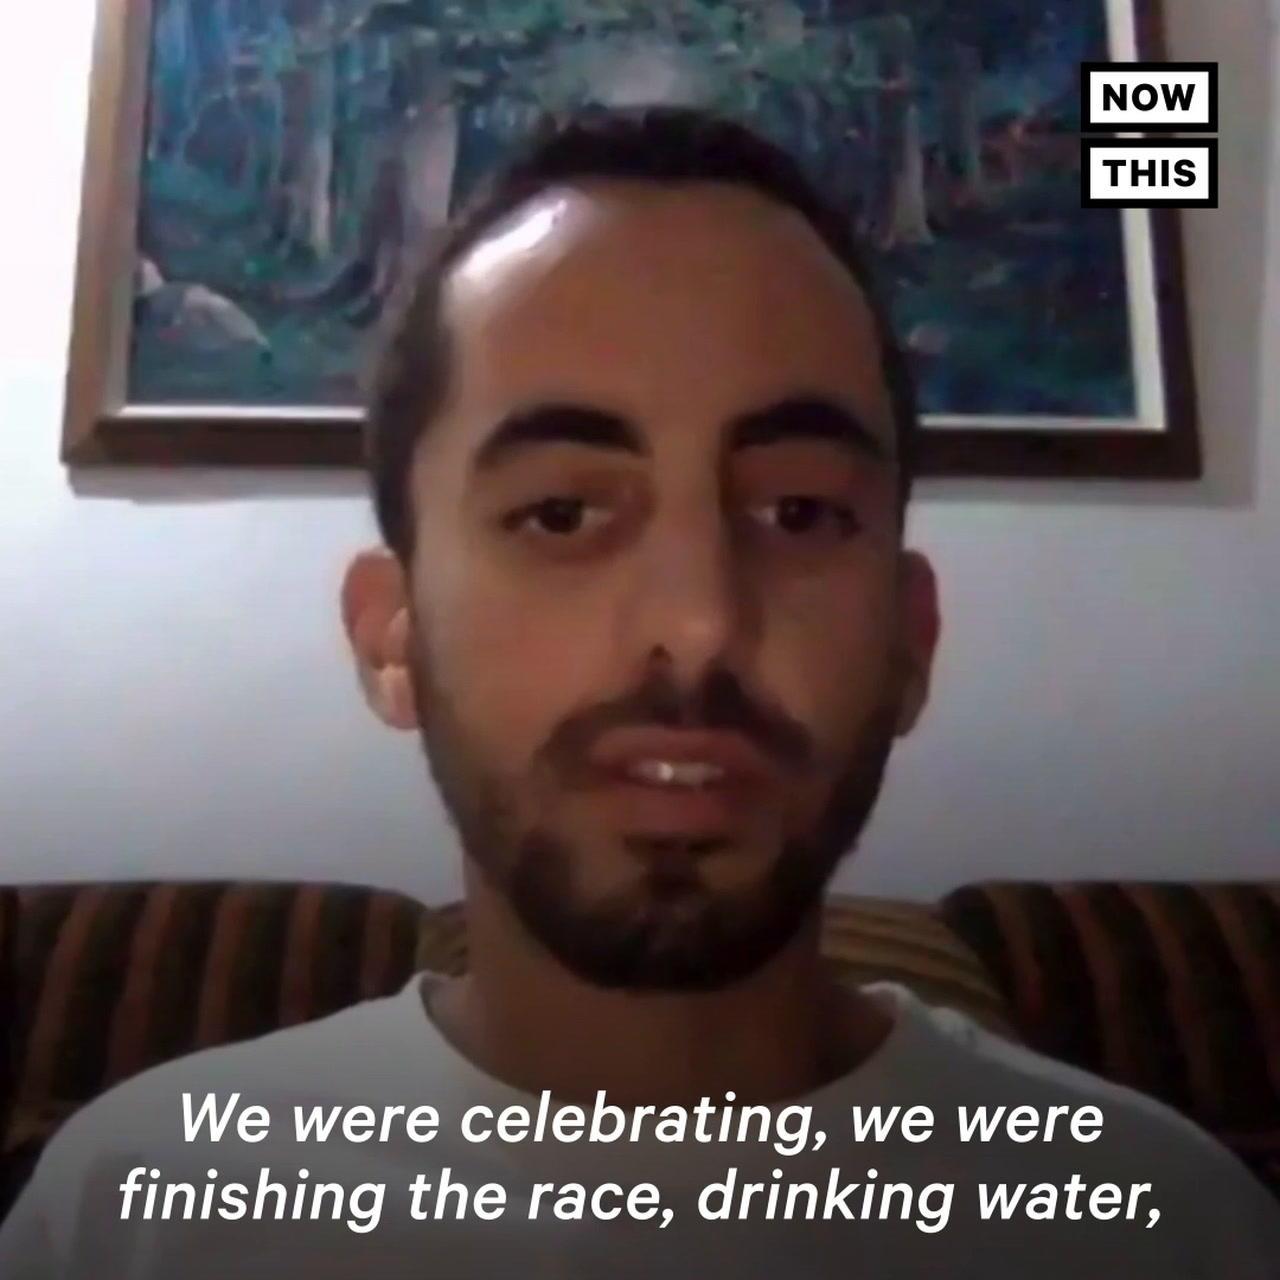 Israeli Forces Attack Finish Line of Race in East Jerusalem